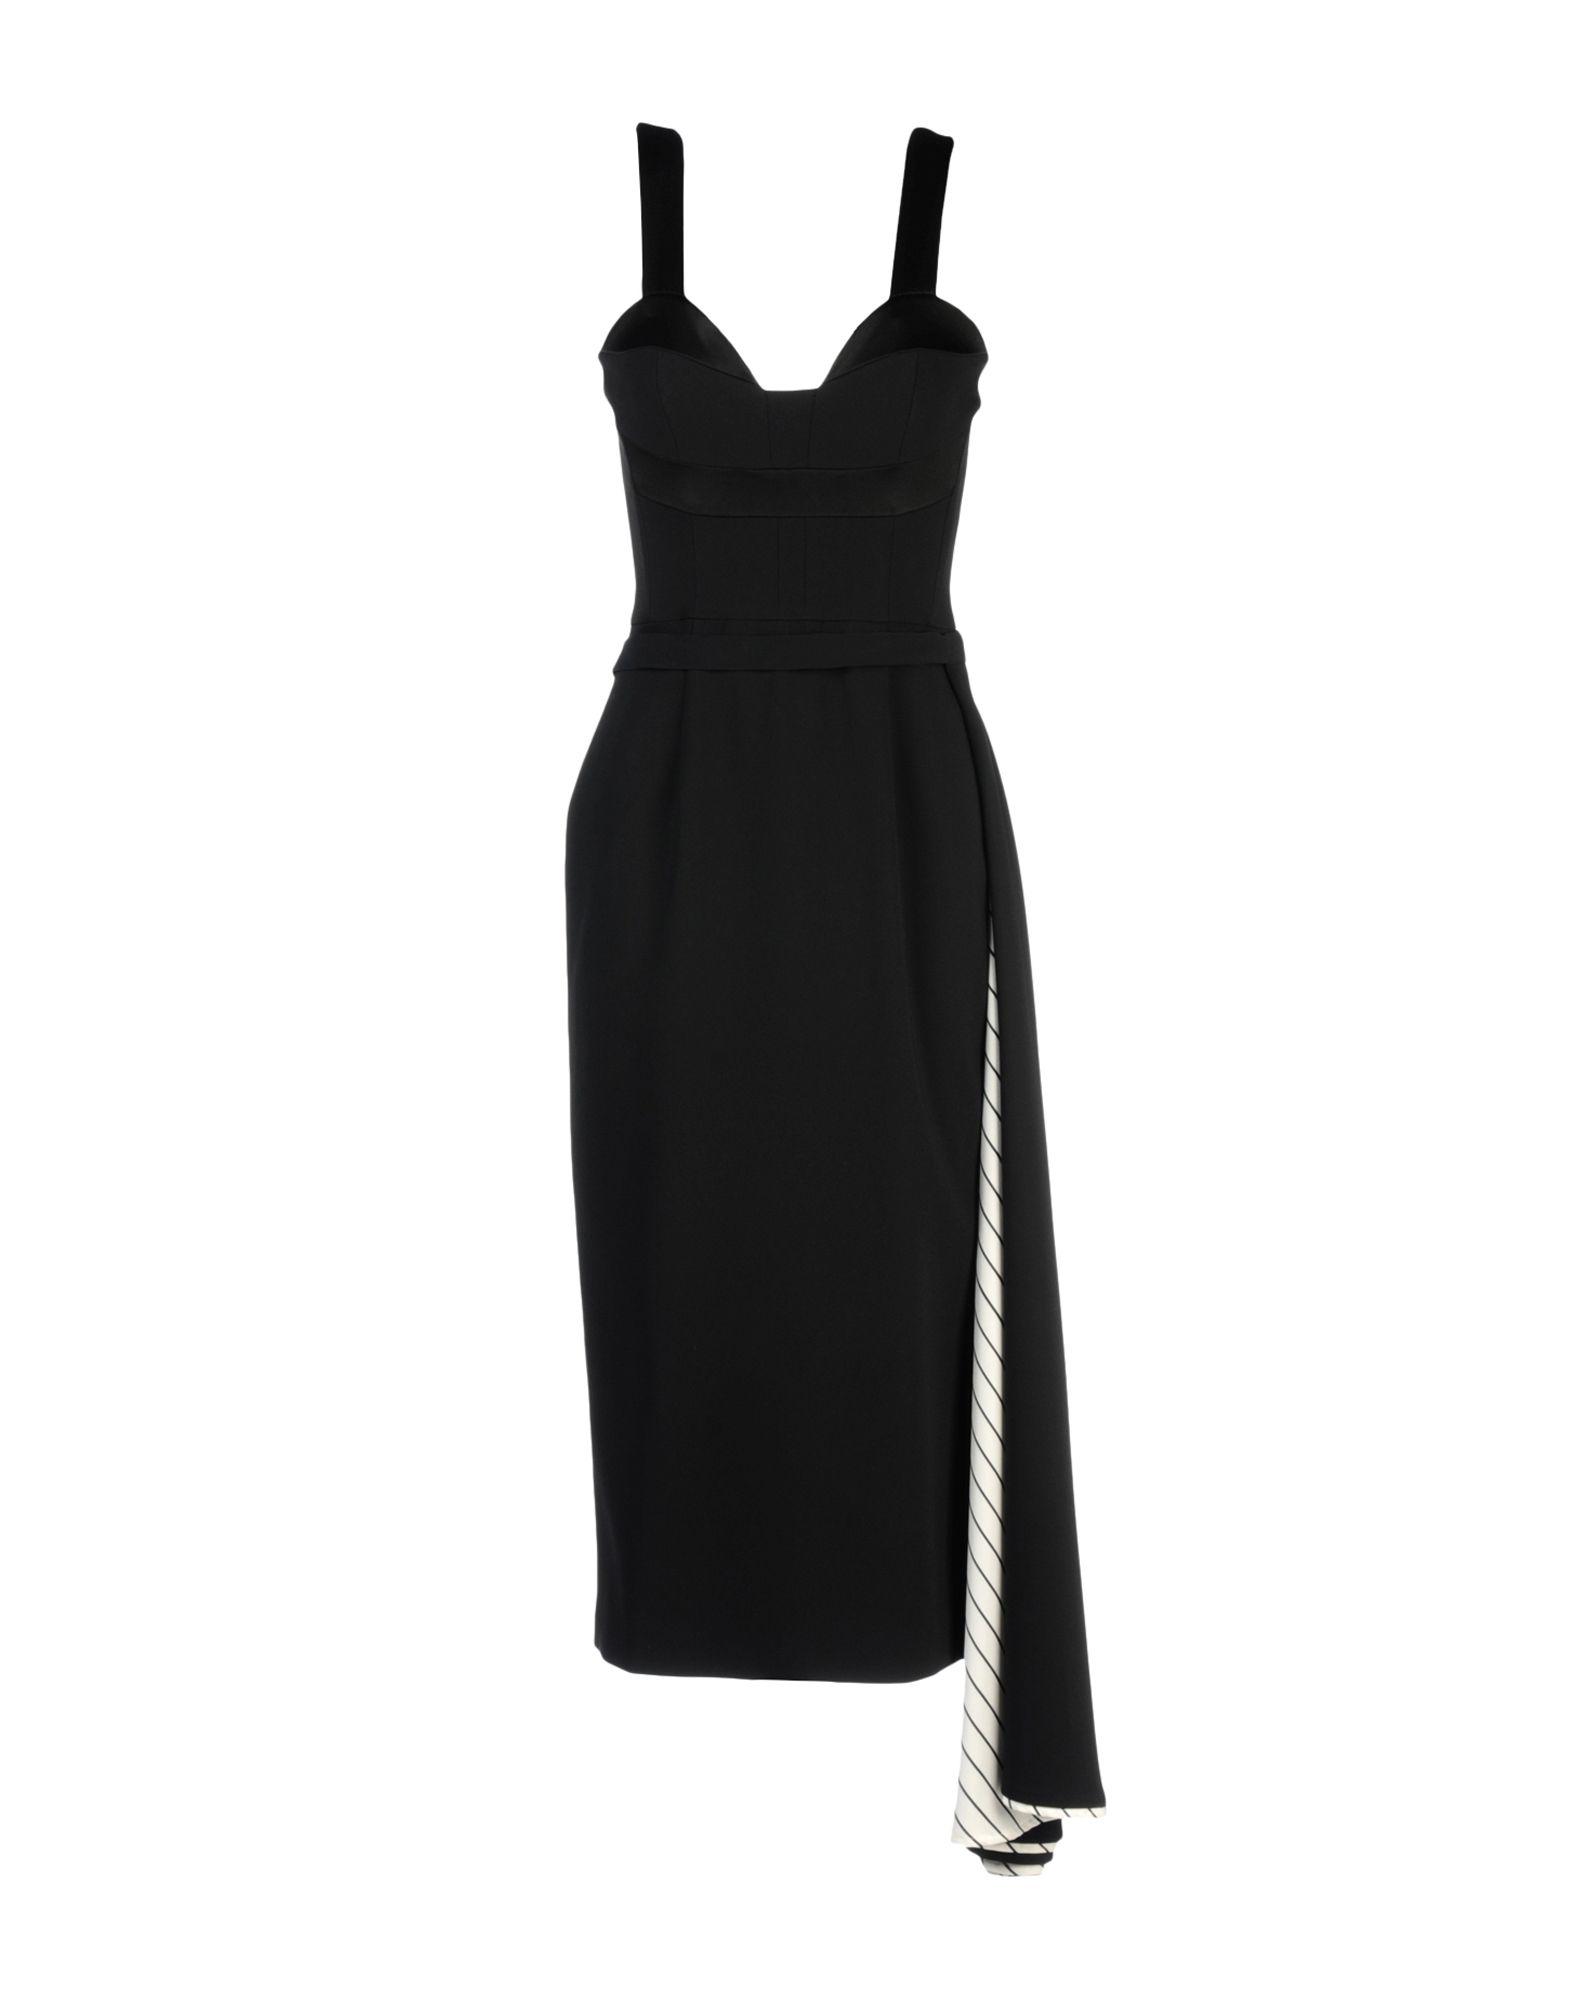 DANIELE CARLOTTA Midi Dress in Black